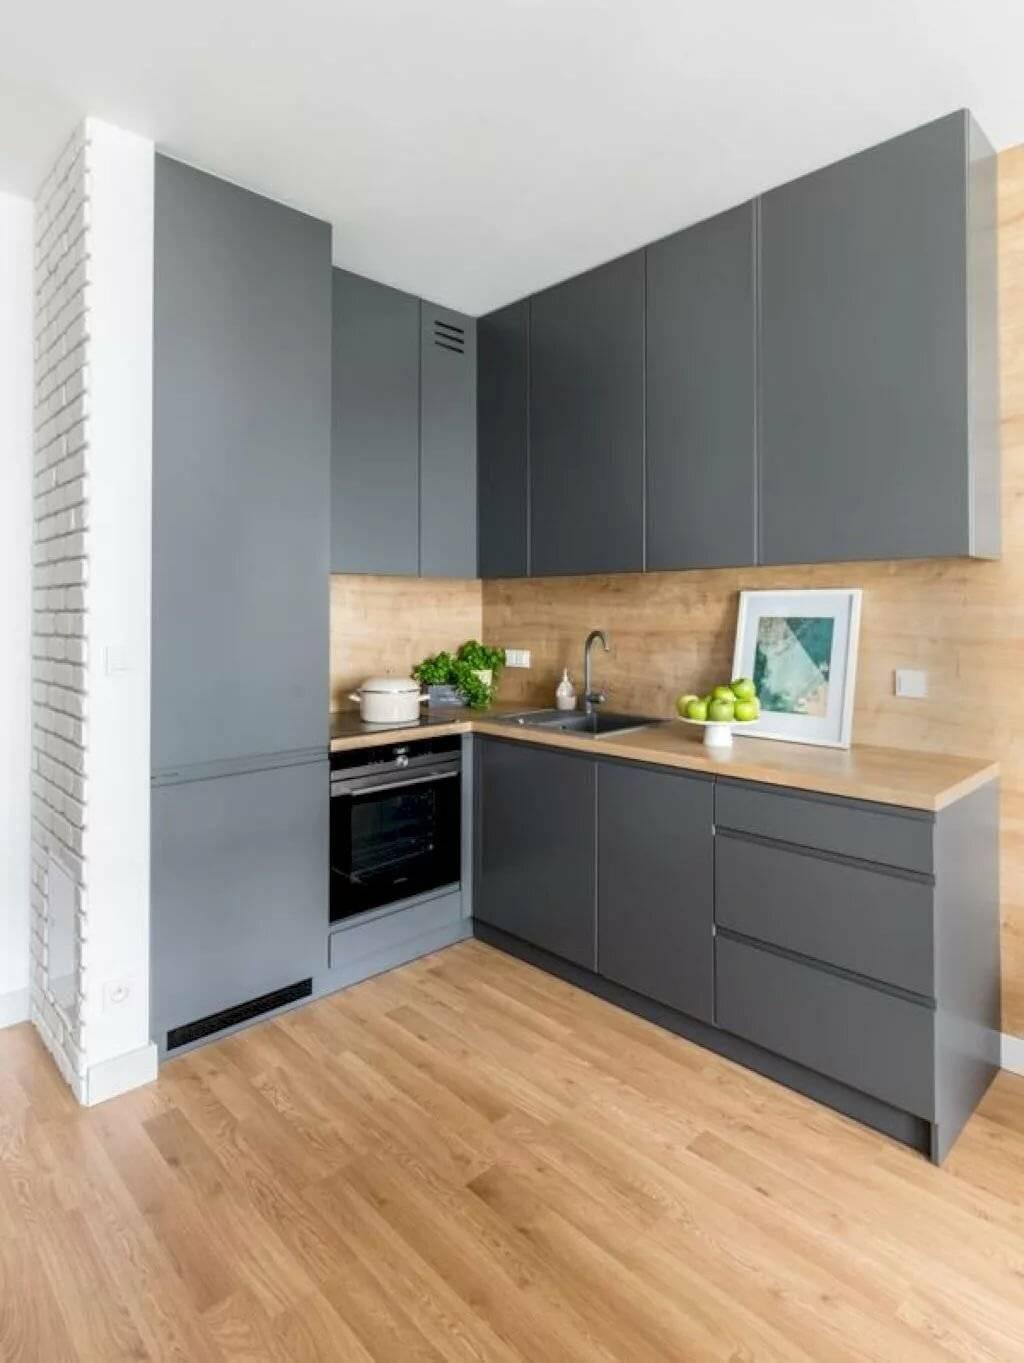 Натяжной потолок на кухне: за и против — объективный взгляд